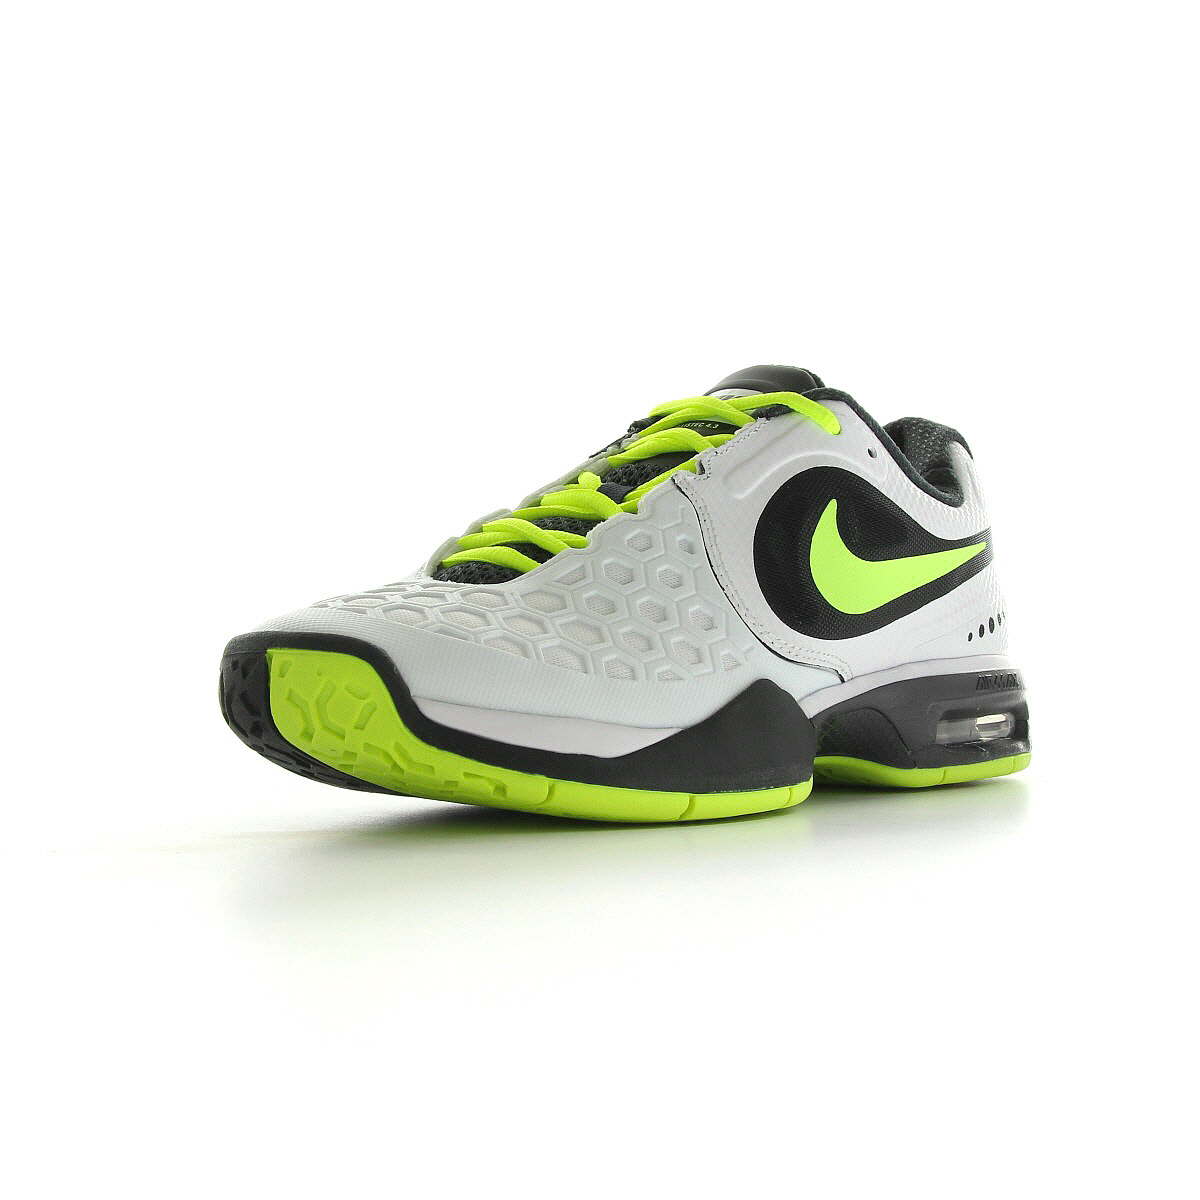 87ee2e152a444 Nike Air Max Courtballistec 2.3